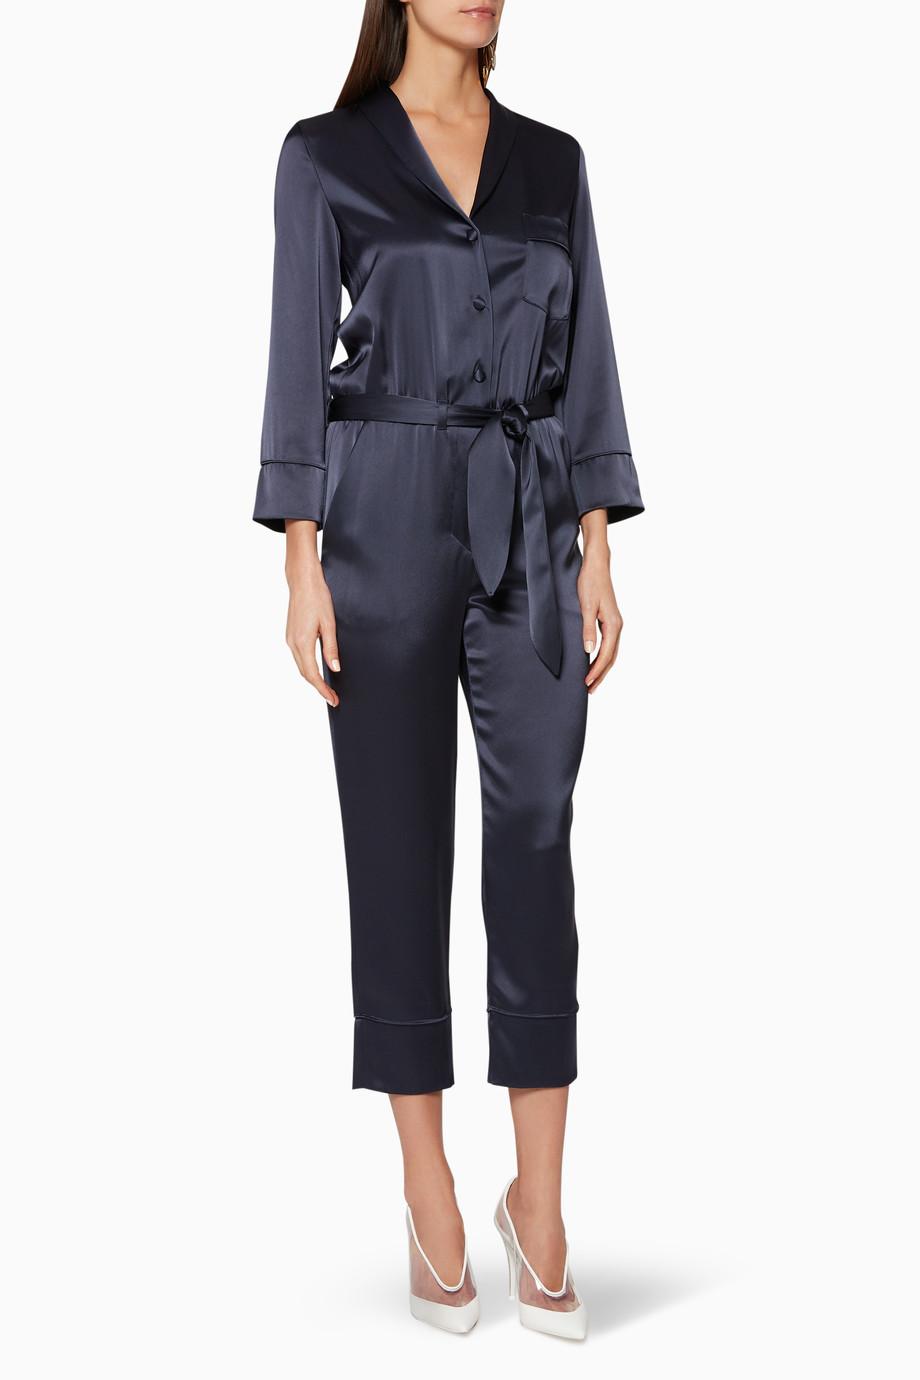 9e805293daad Shop NANUSHKA Blue Navy Yuma Jumpsuit for Women